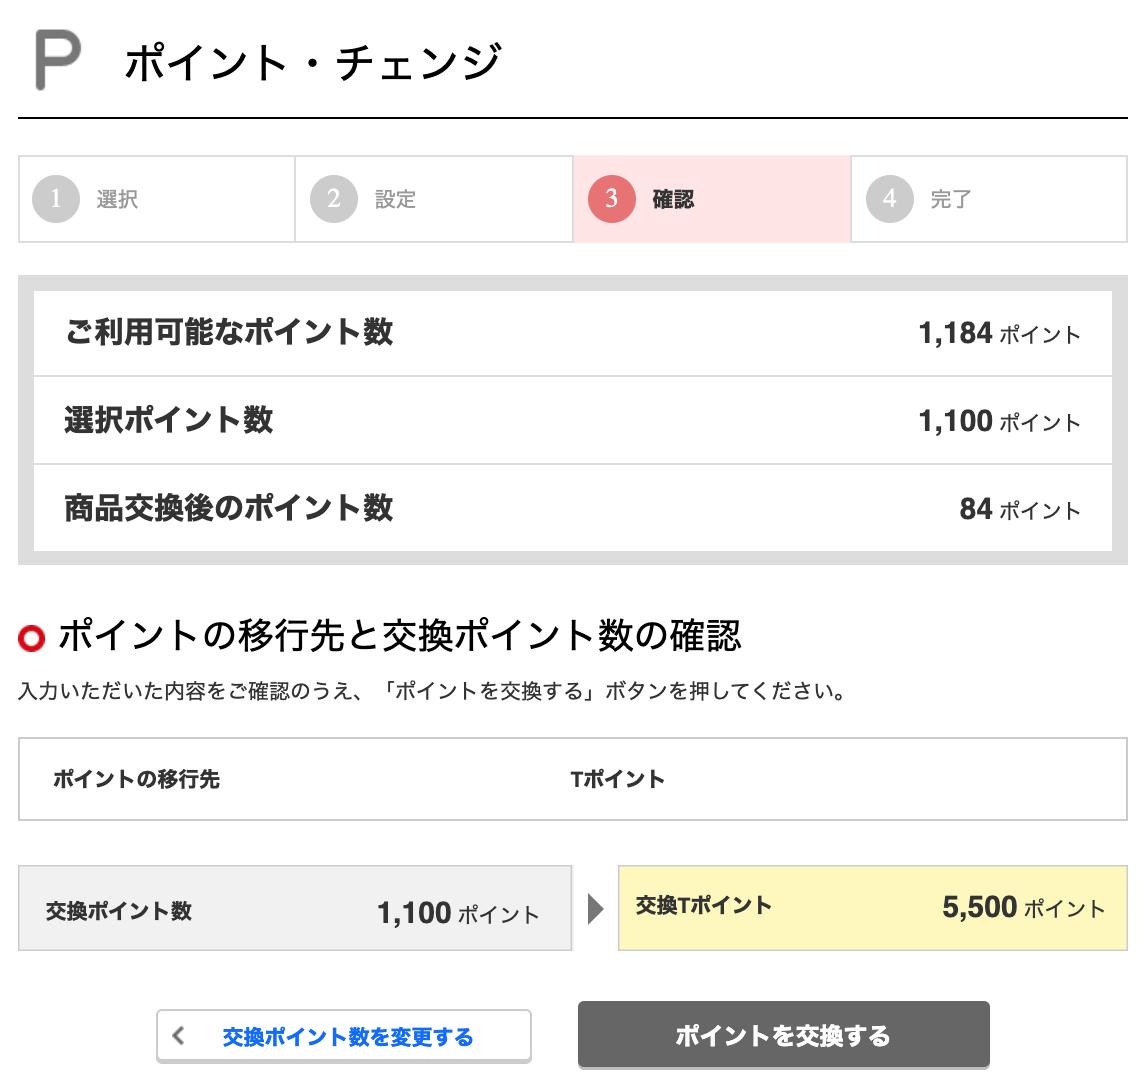 f:id:i-chihiro93115:20191230092615p:plain